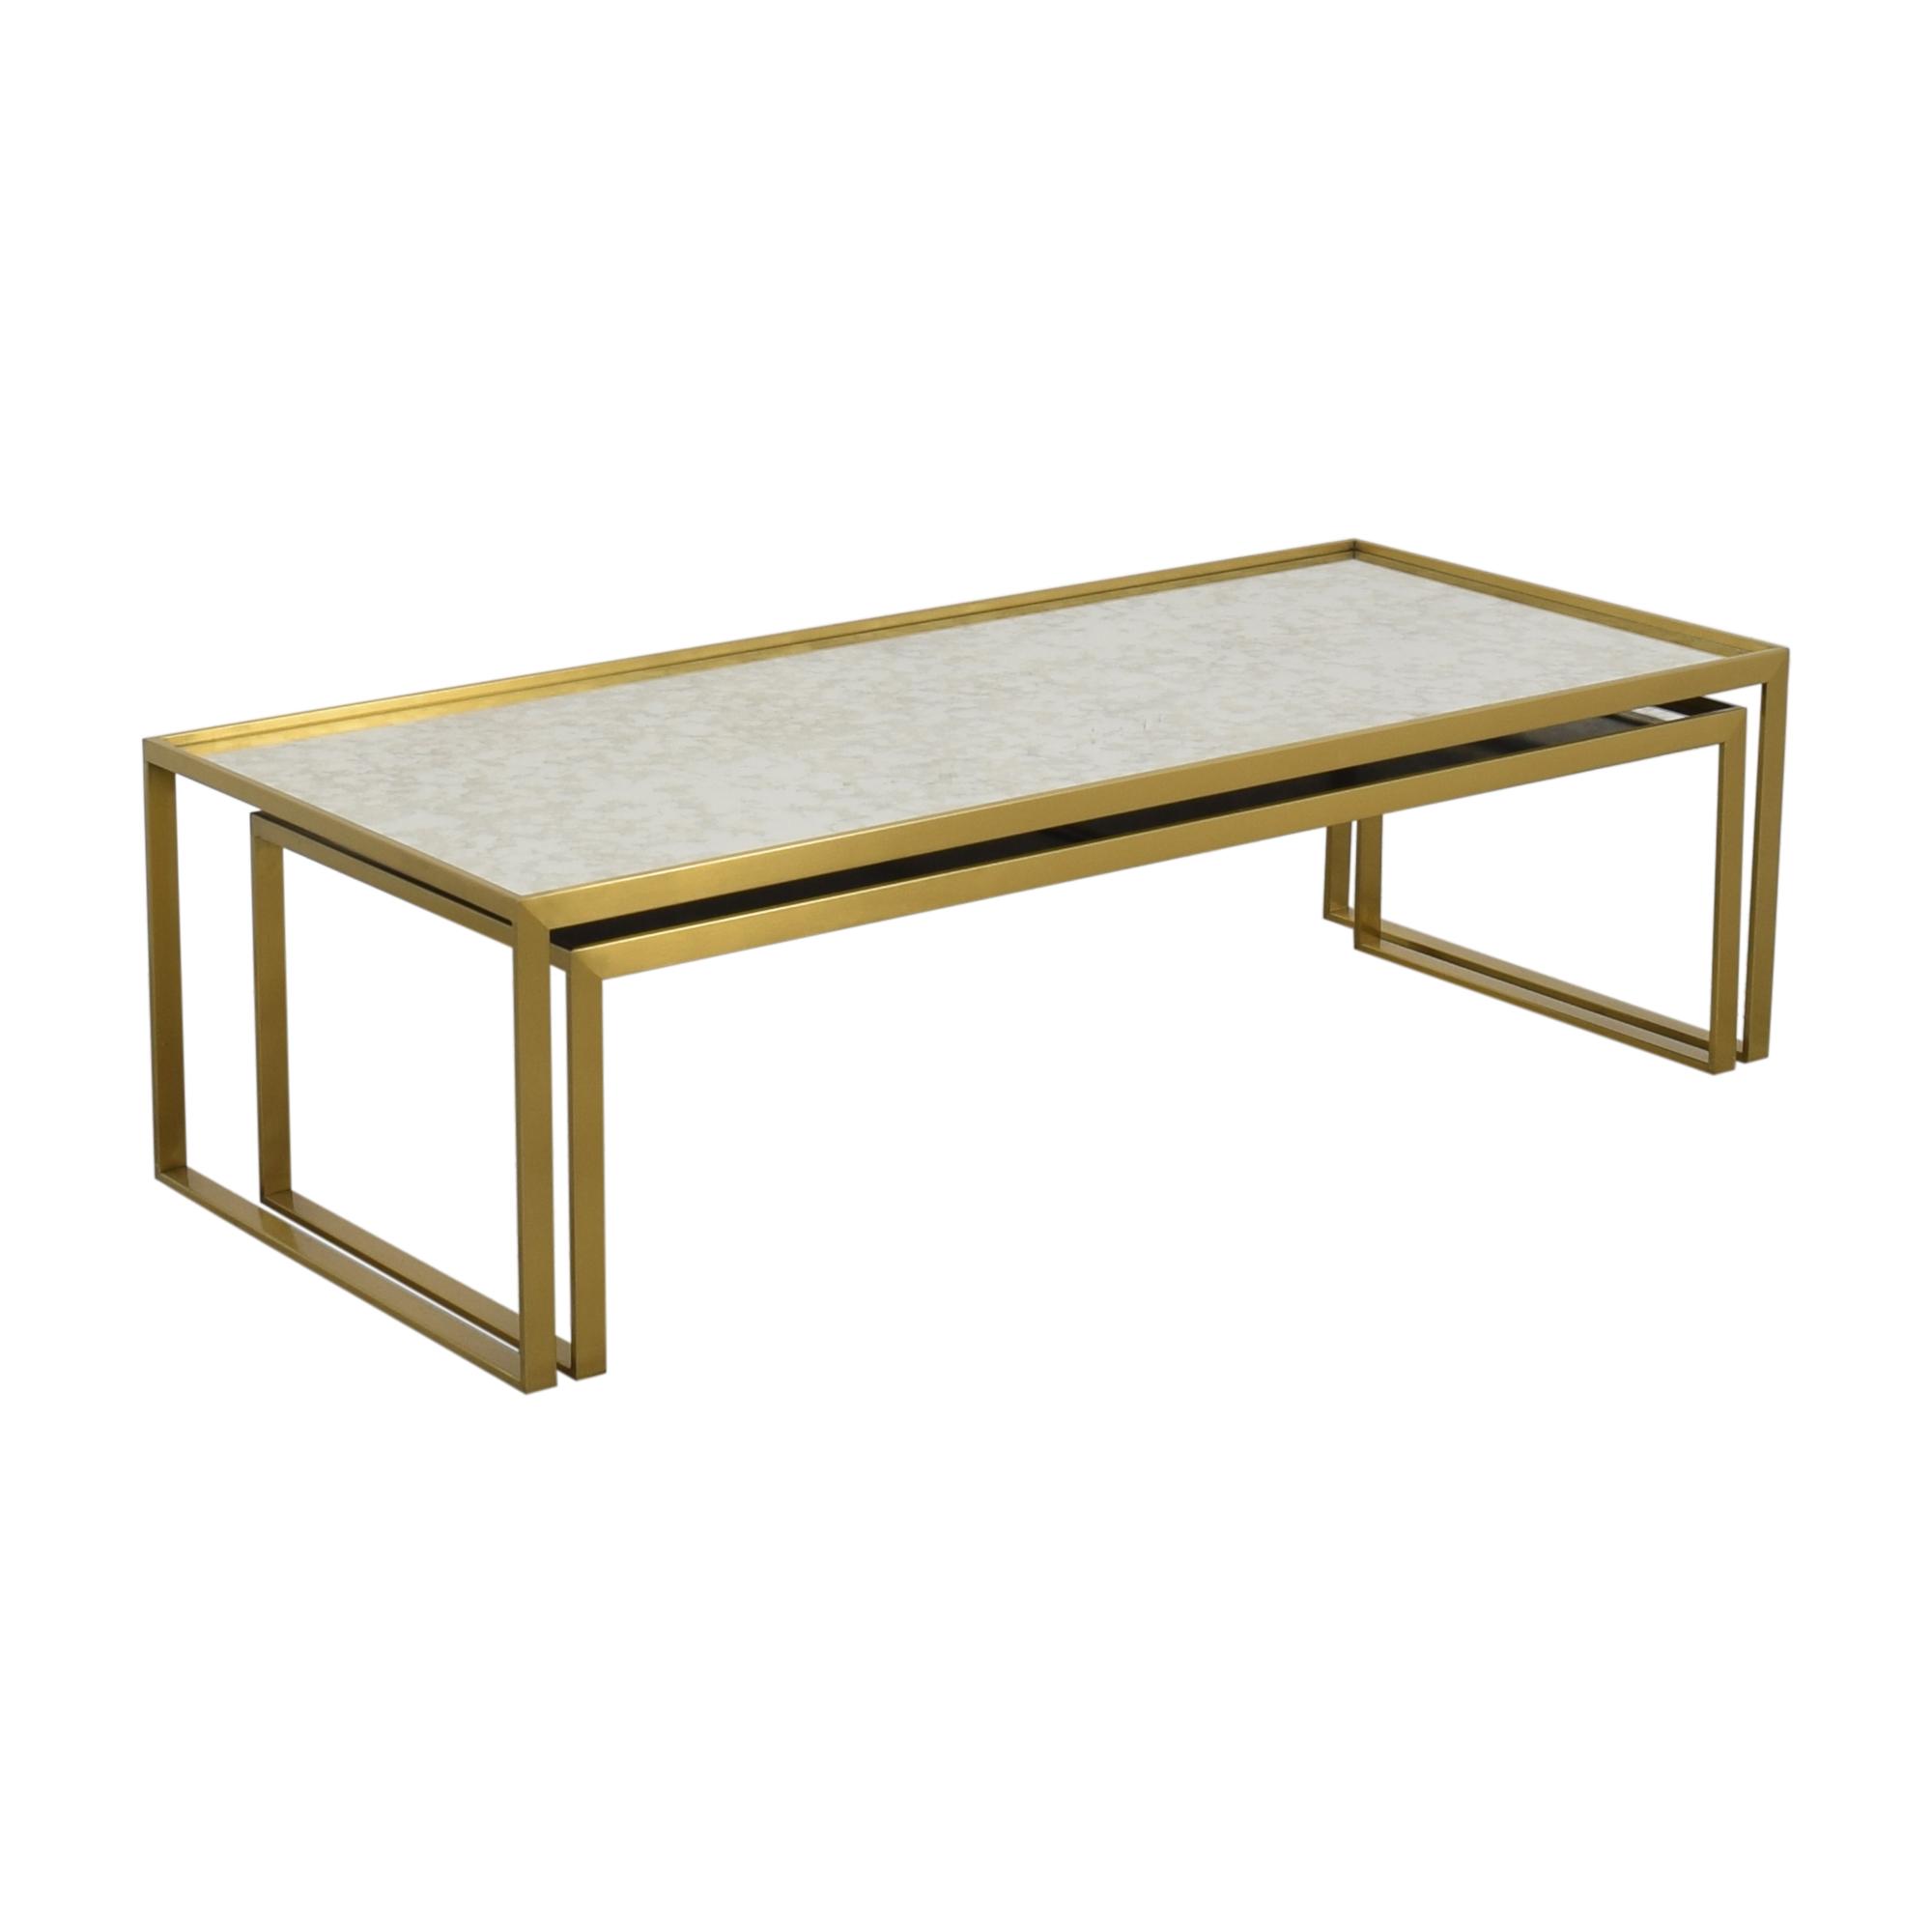 Mitchell Gold + Bob Williams Mitchell Gold & Bob William Astor Nesting Table used